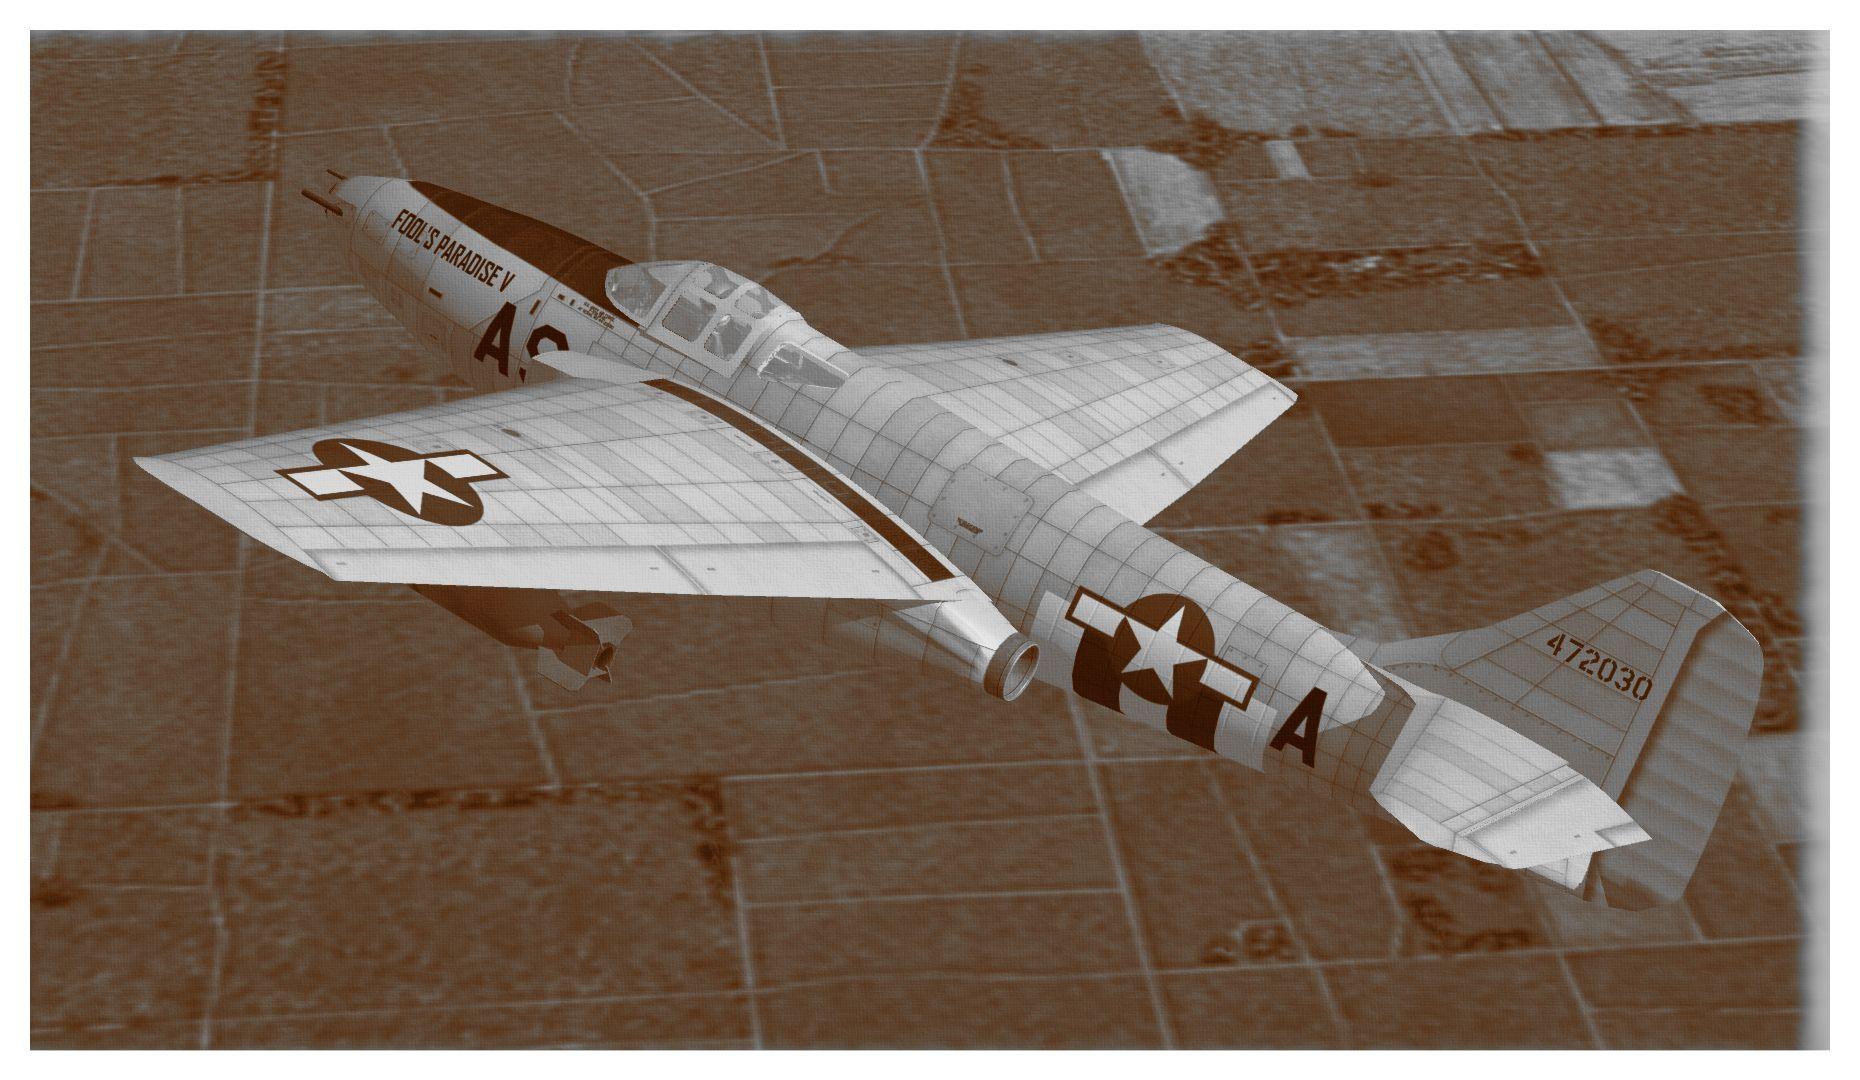 USAAF%20P-59B%20AIRACOMET.09_zpsiojczgvb